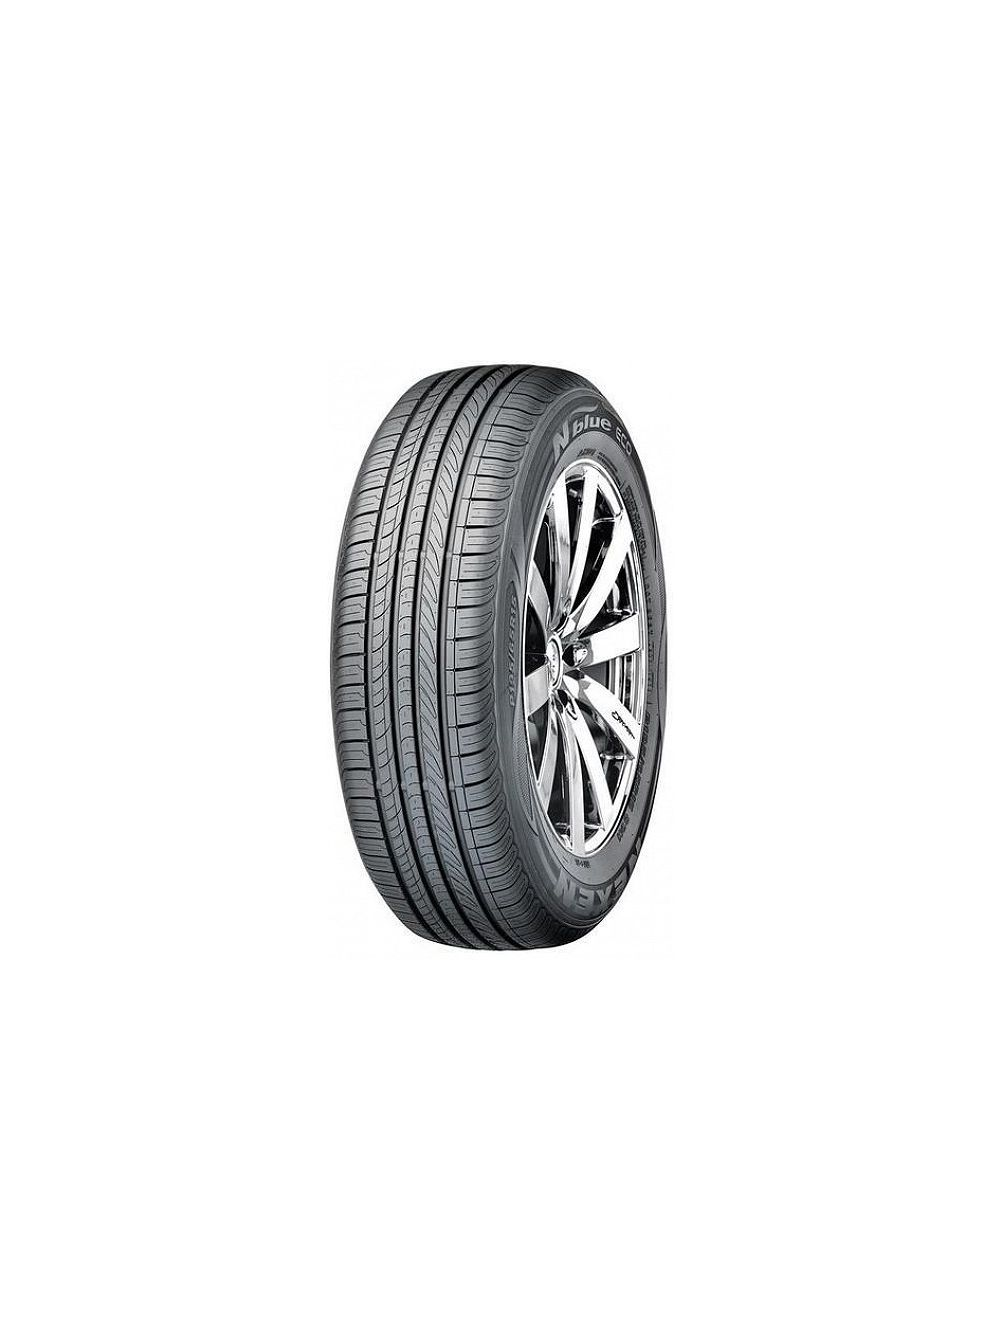 Nexen 225/55R16 V N-Blue Eco SH01 XL Nyári gumi